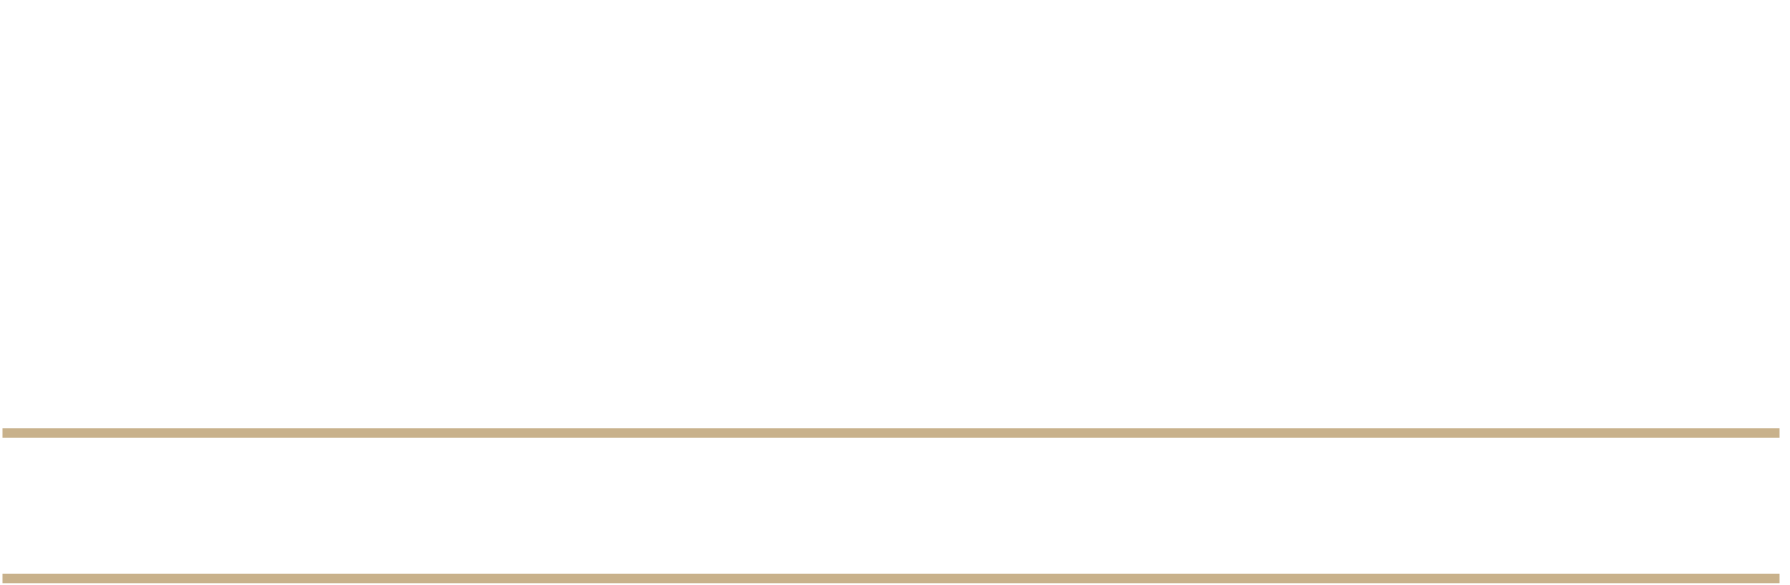 George Washington University School of Public Health - home